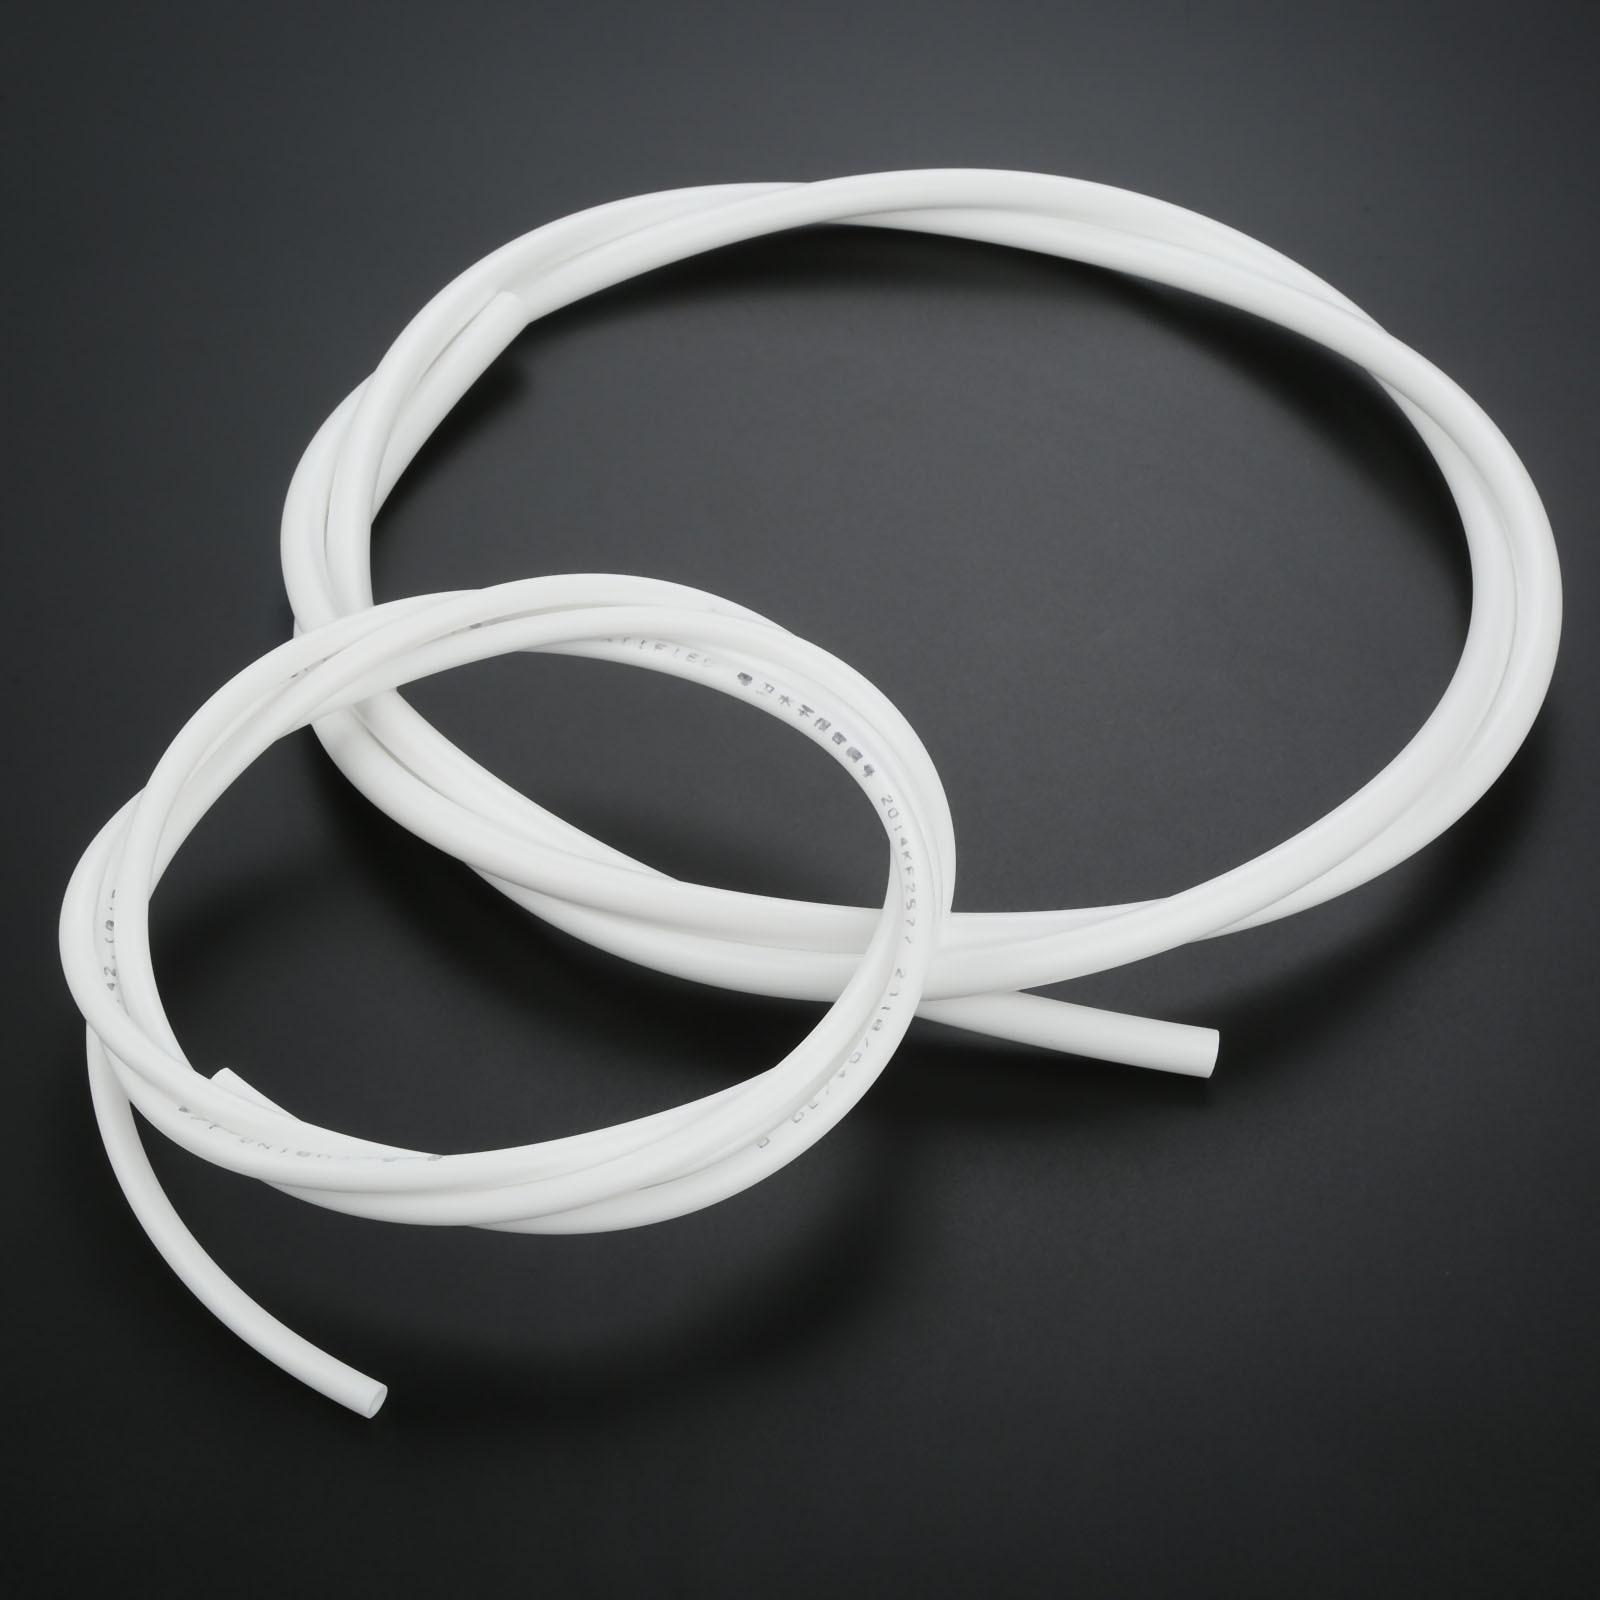 "2 metros RO agua 1/4 ""3/8 pulgadas OD PE manguera tubo Flexible blanco tubo para sistema de filtro de acuario de ósmosis inversa 2 M/6.56ft"